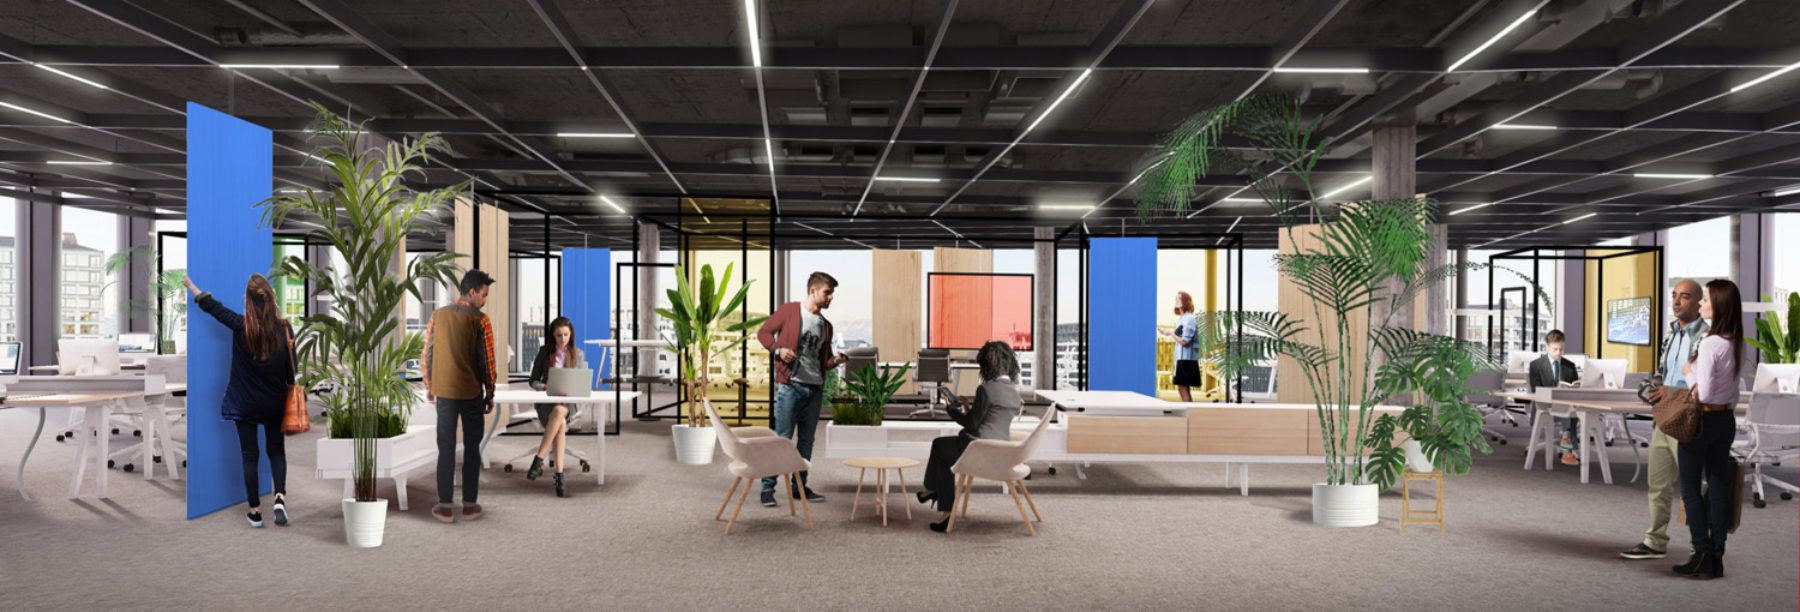 Media Tech Company Office Design